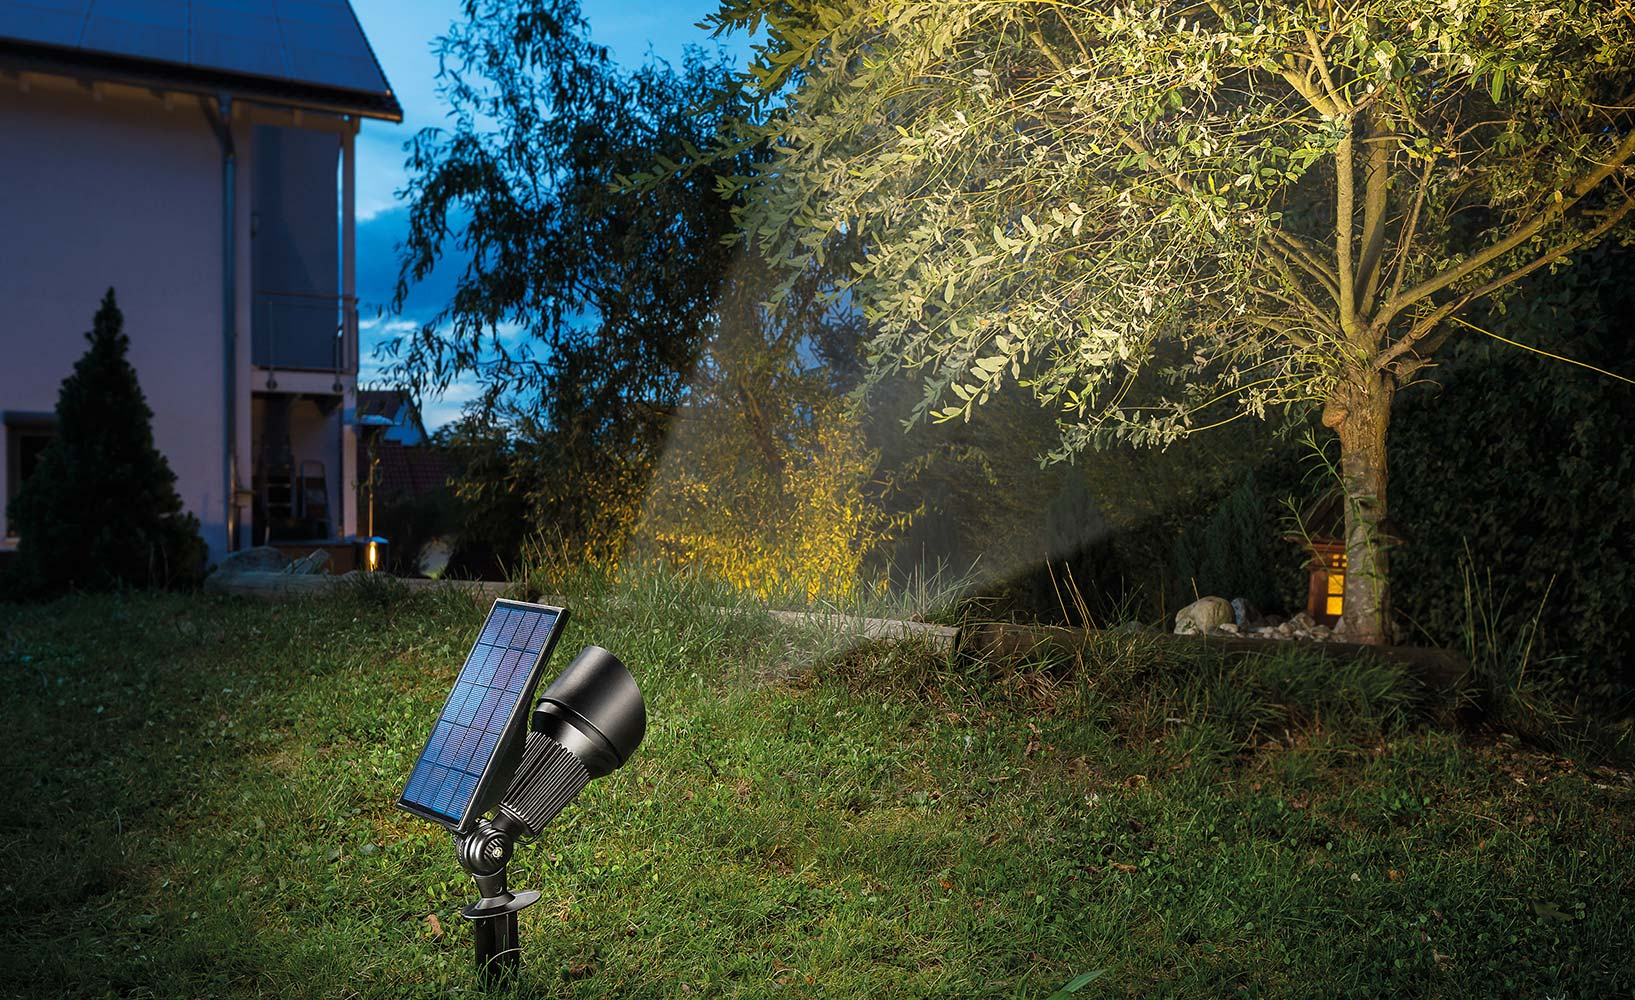 kreative Außengestaltung mit Solar-LEDs